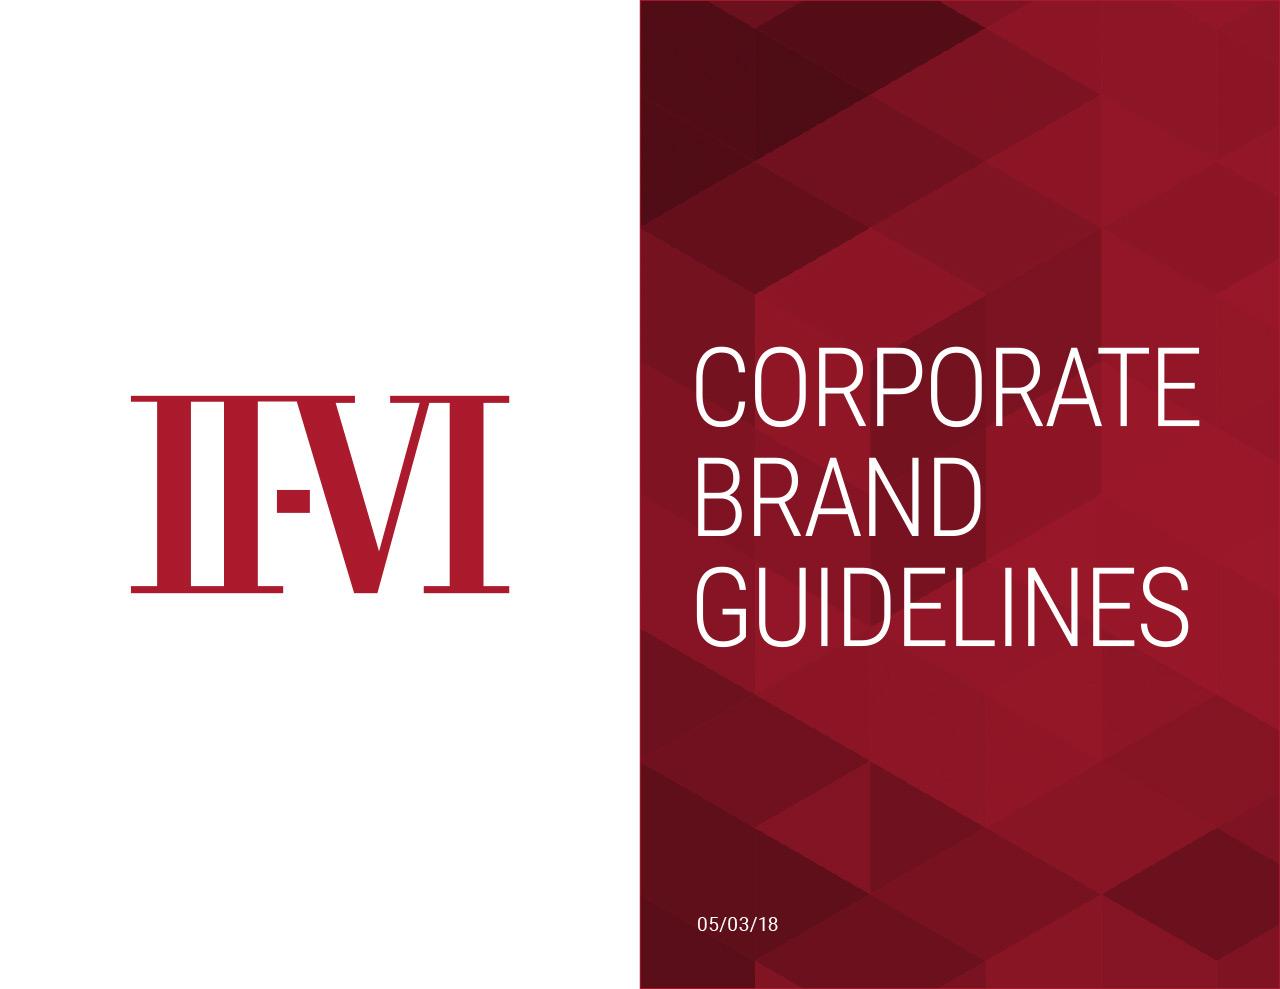 branding guidelines cover